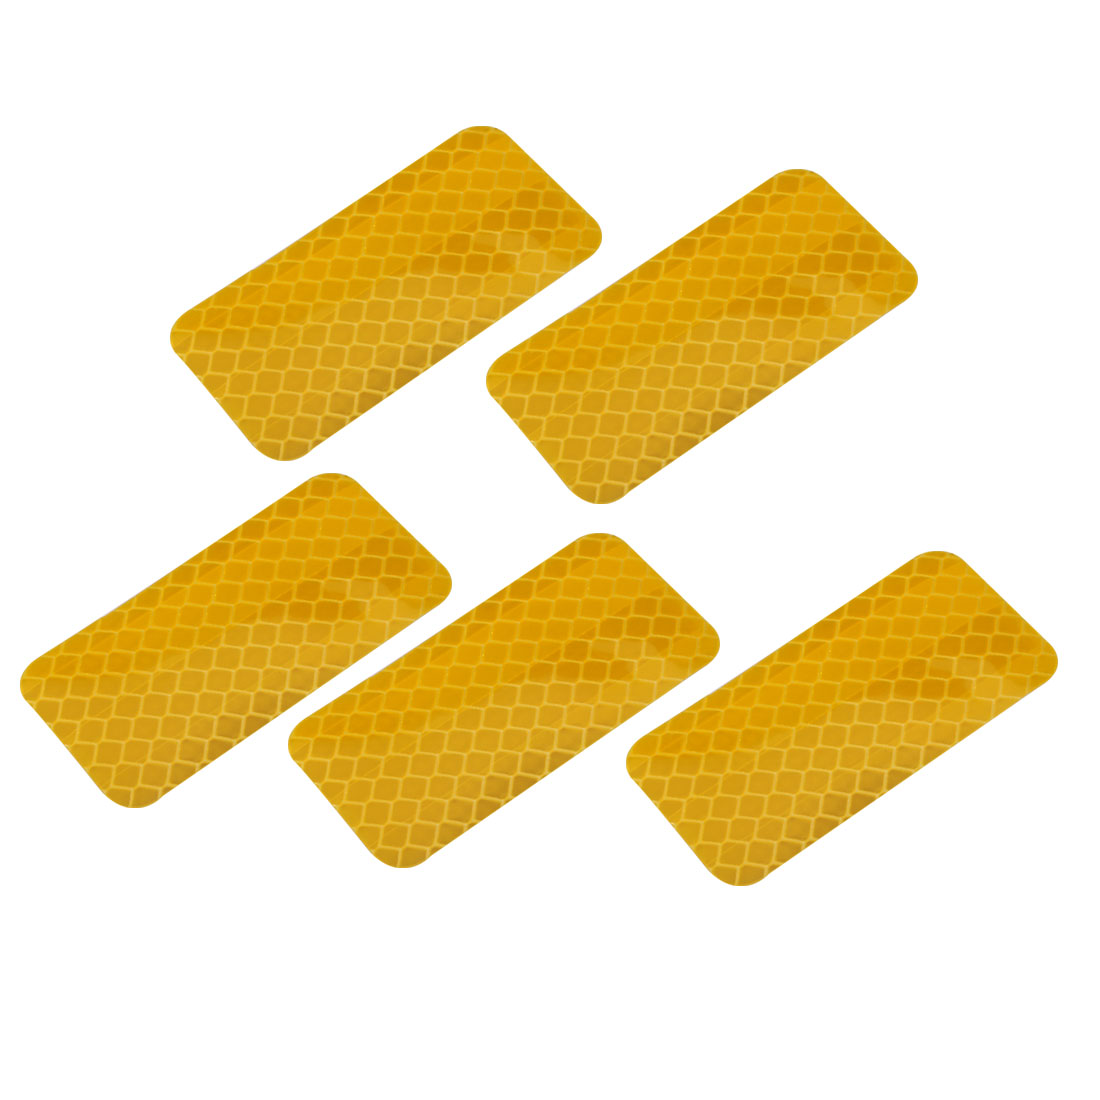 5pcs Honeycomb Reflective Warning Tape Film Sticker Yellow 30mm Width 60mm Long